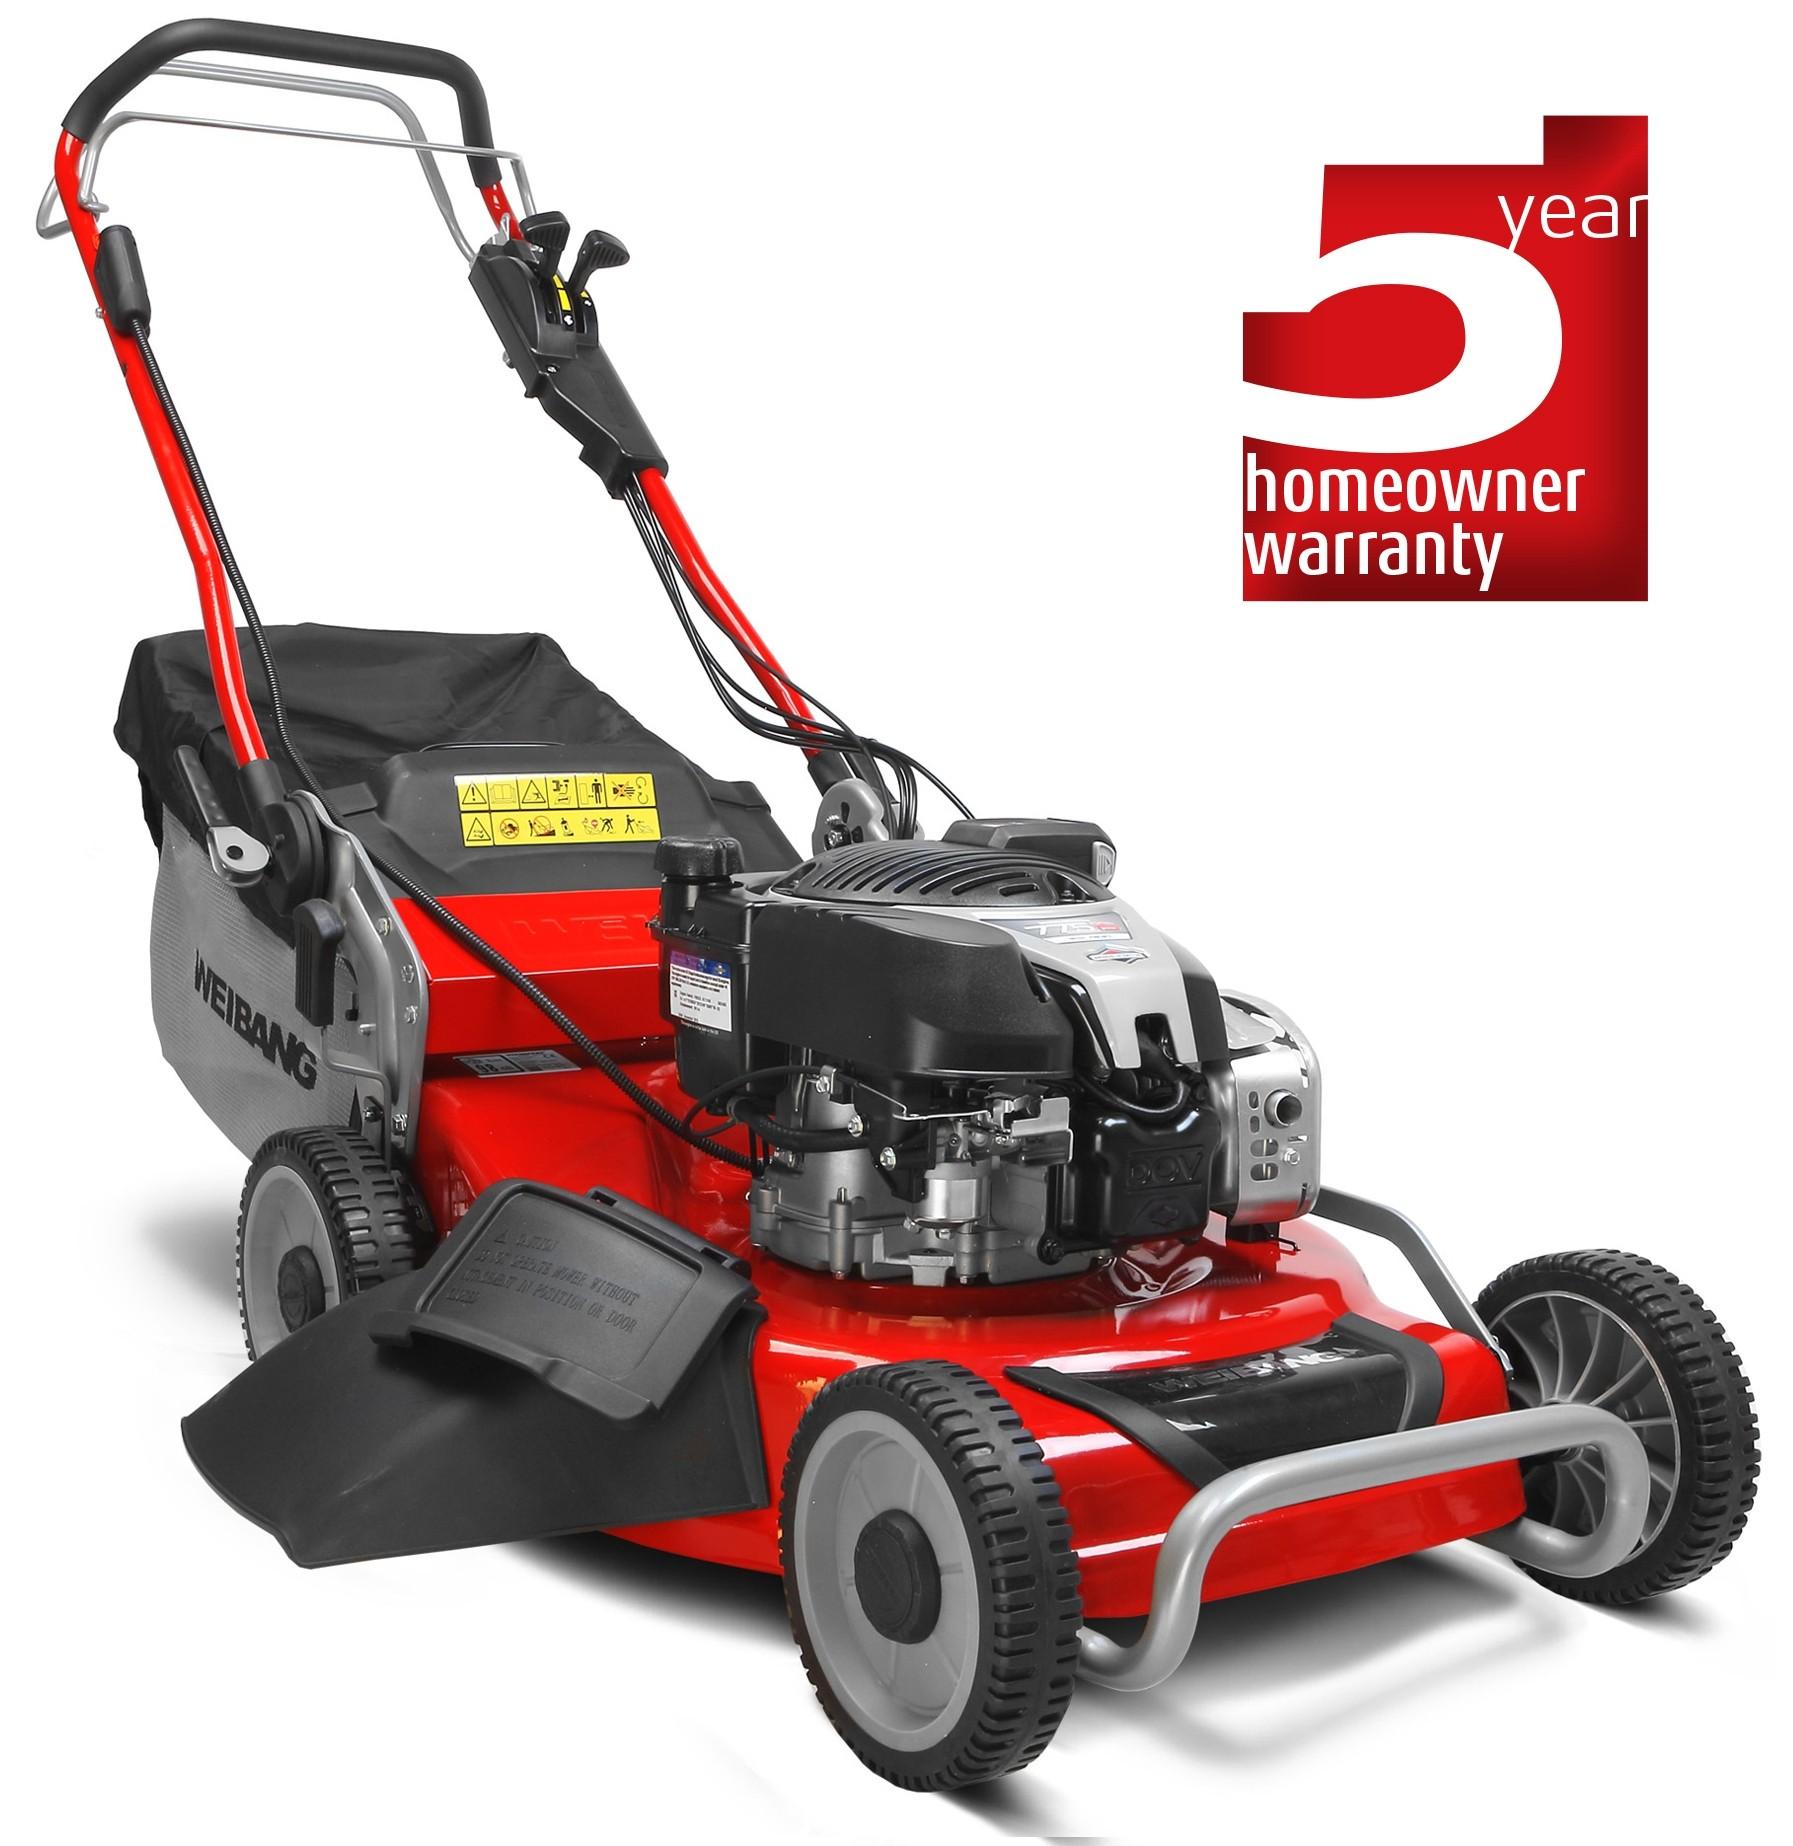 Virtue 53 SVE 3 in 1 electric start petrol lawn mower